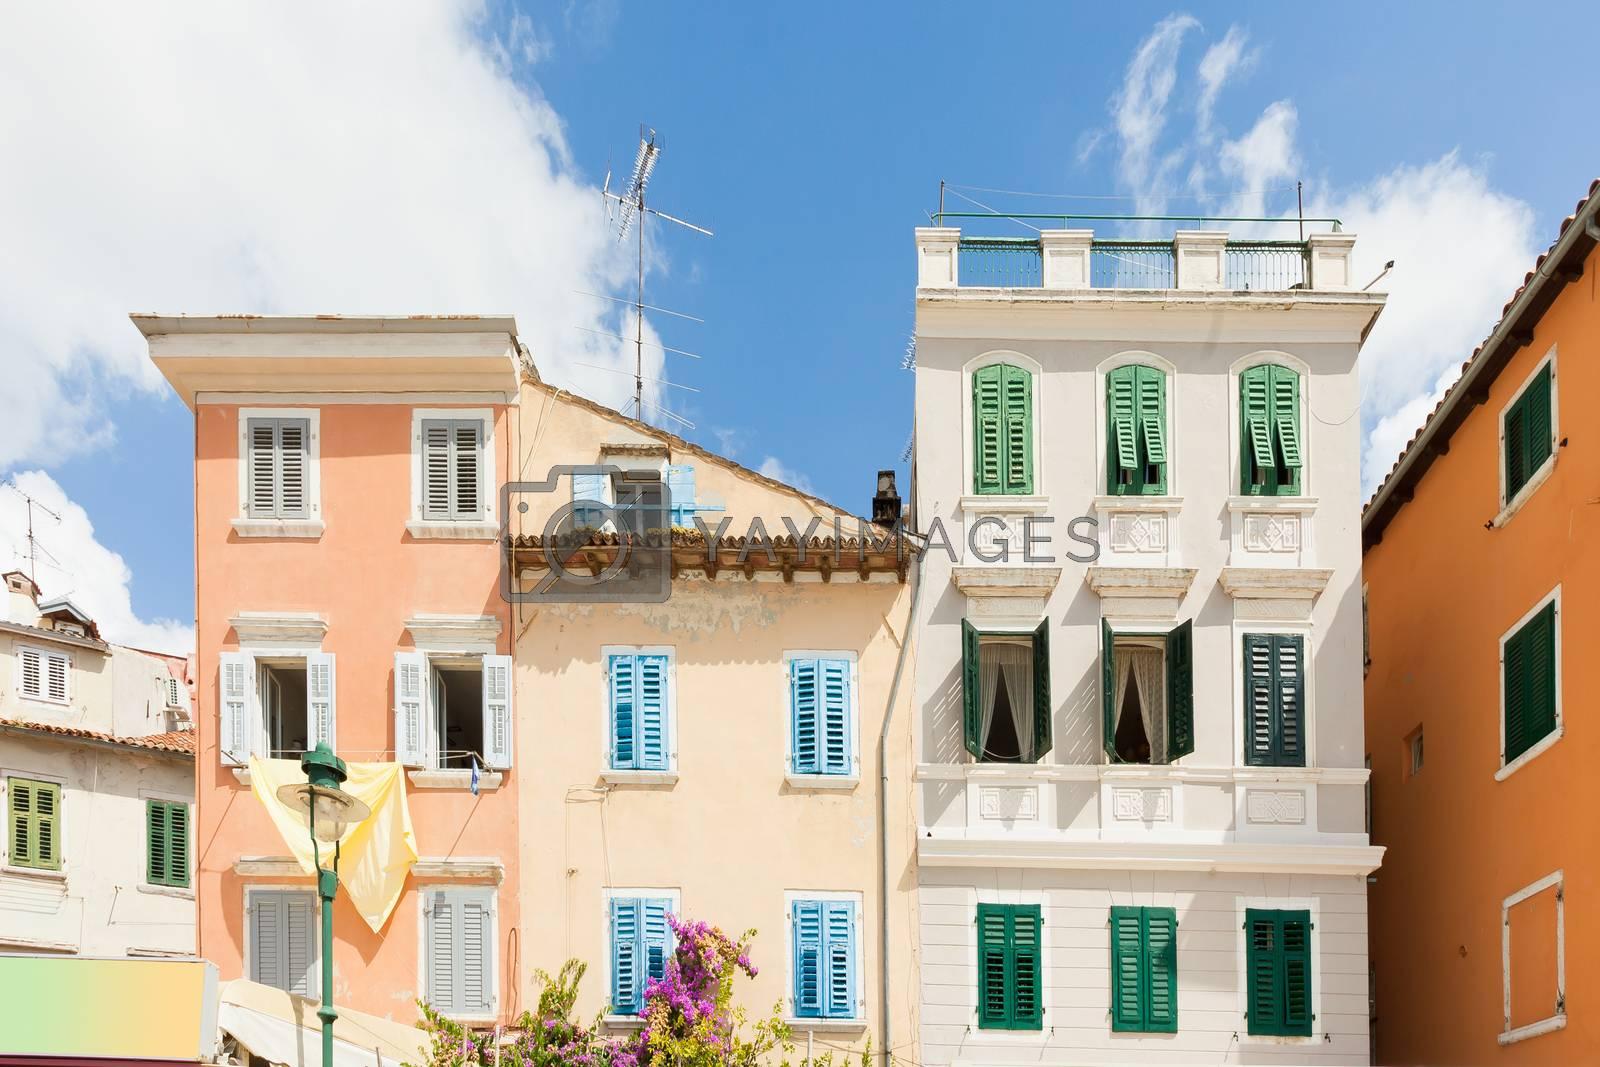 Rovinj, Istria, Croatia, Europe - Beautiful historic architecture in the streets of Rovinj